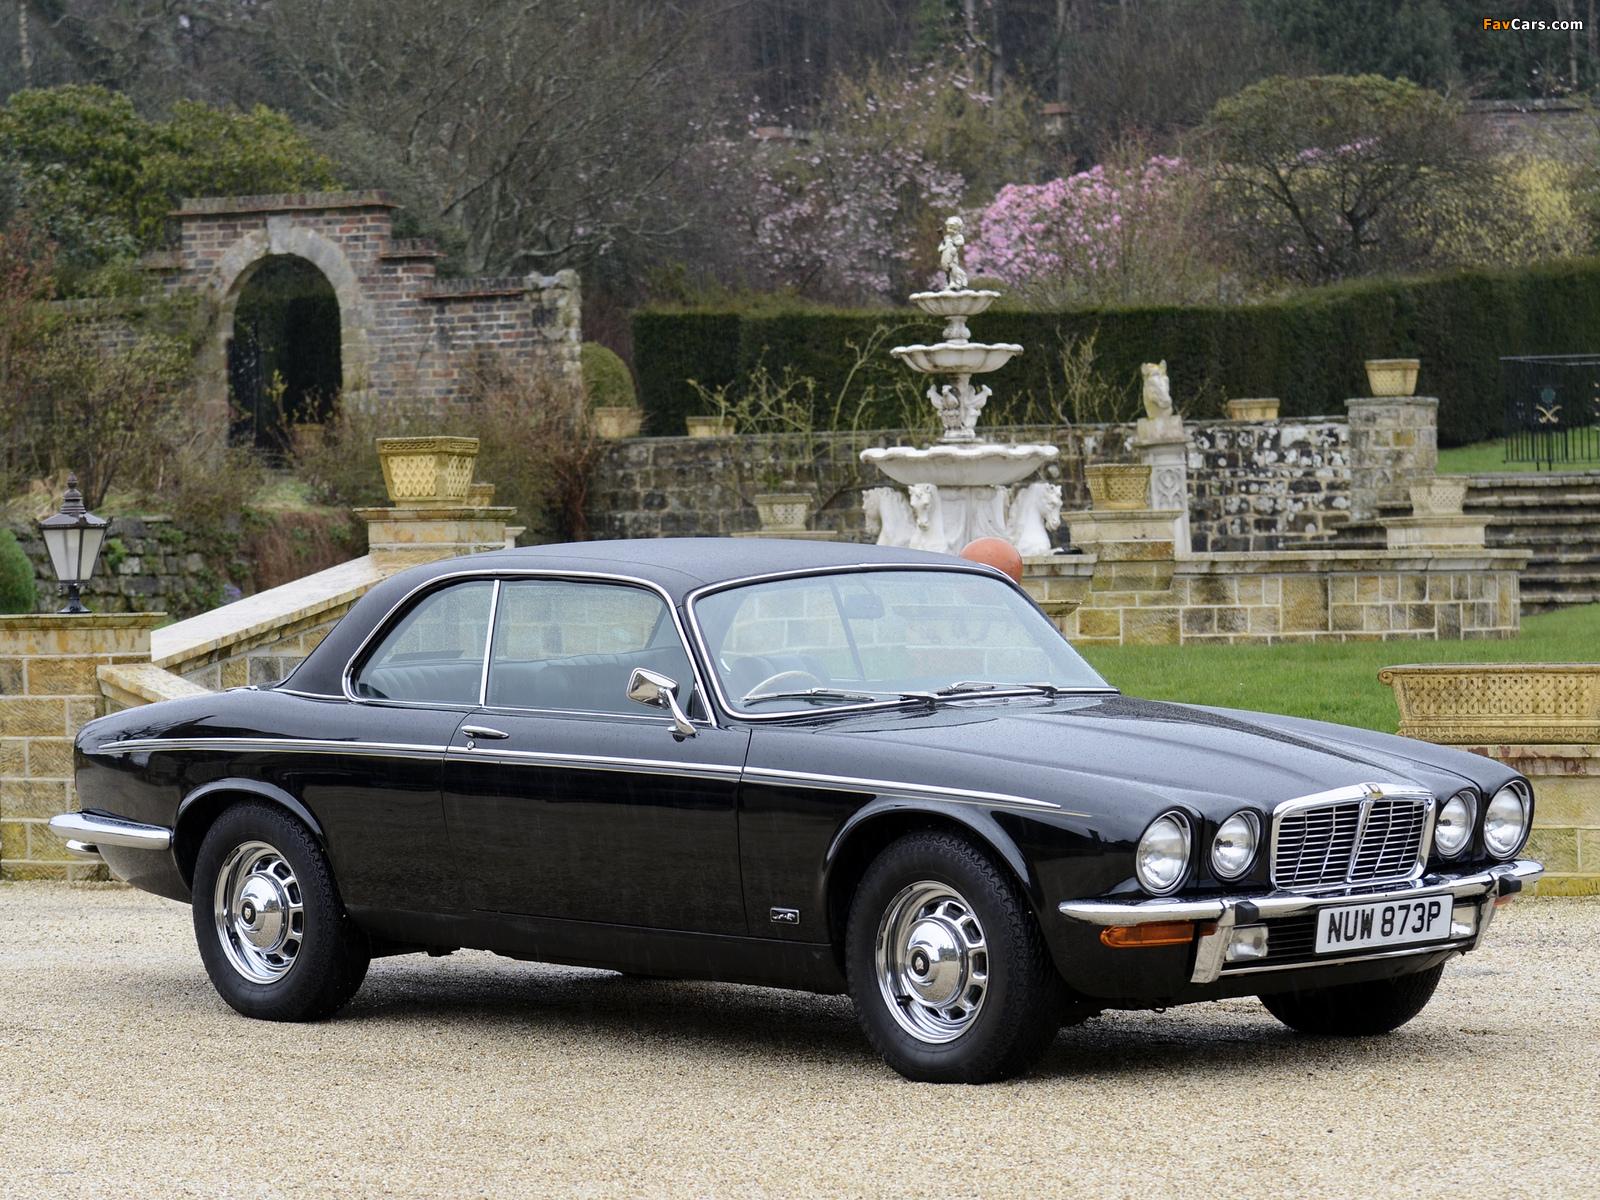 Jaguar Xj6c Series Ii 1975 78 Images 1600x1200